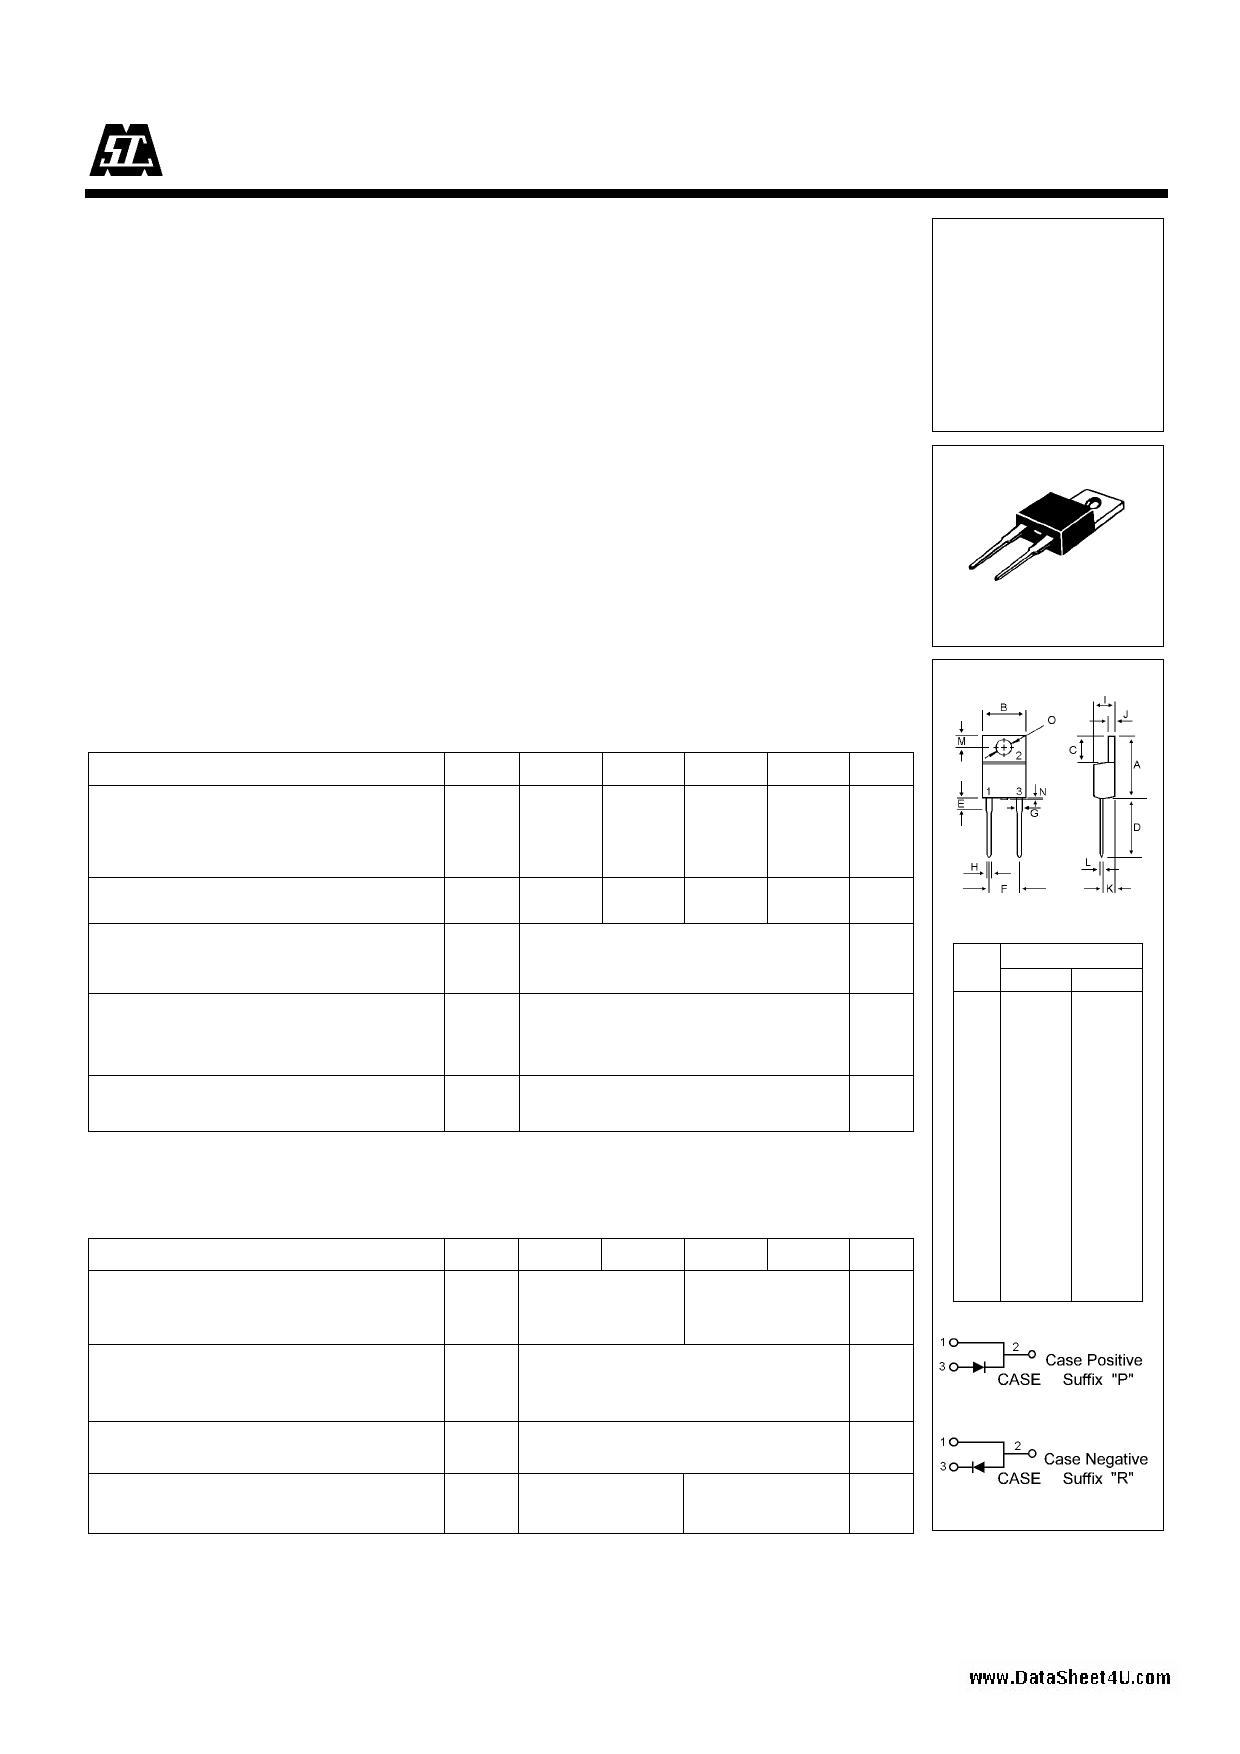 U05A40 datasheet